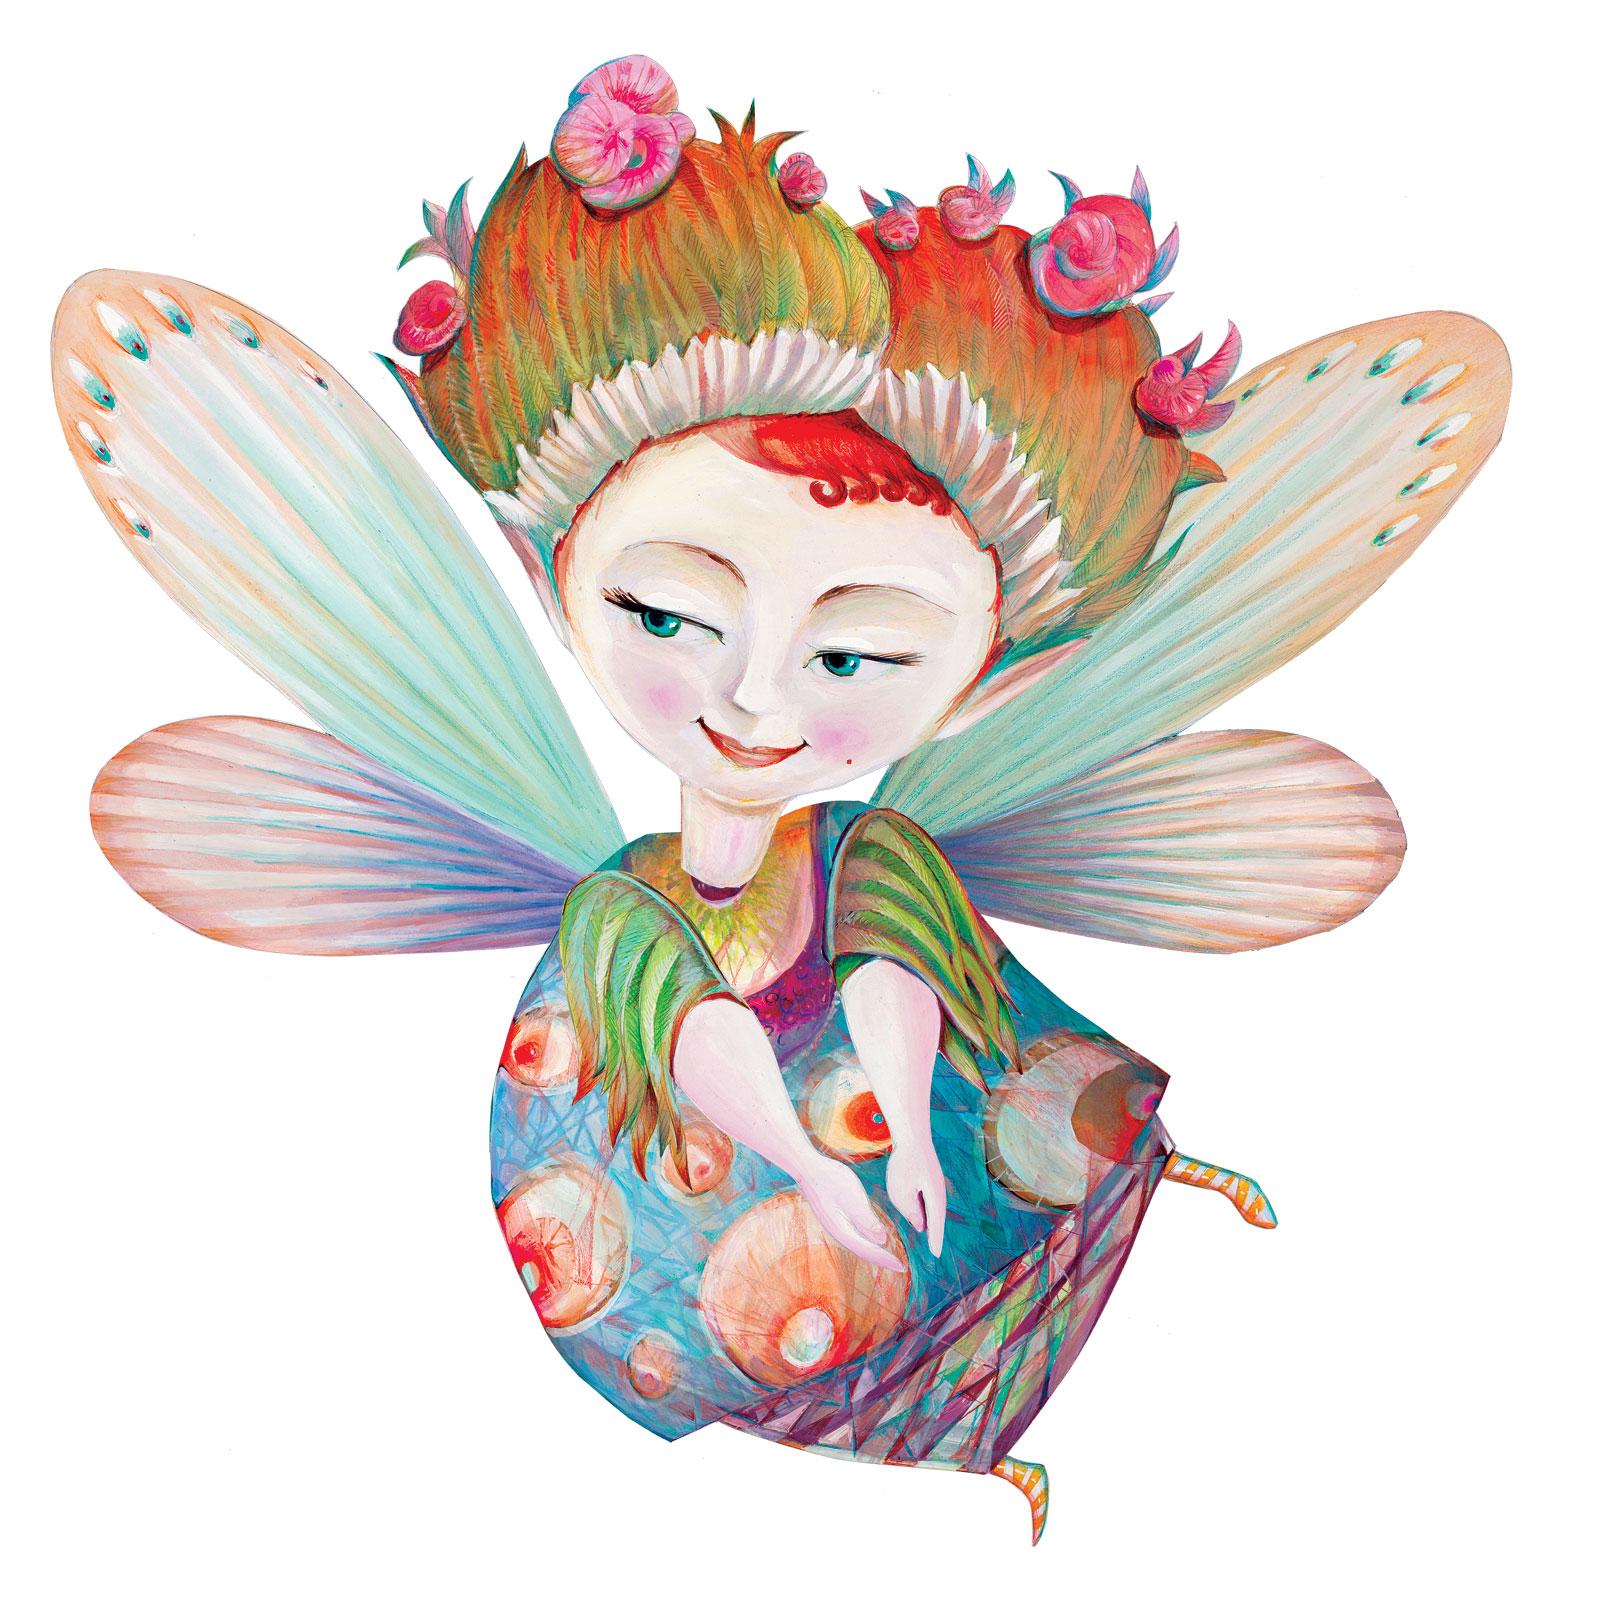 Wall Decoration Figure 'Chloe' - Wooden Fairies | SVOORA on